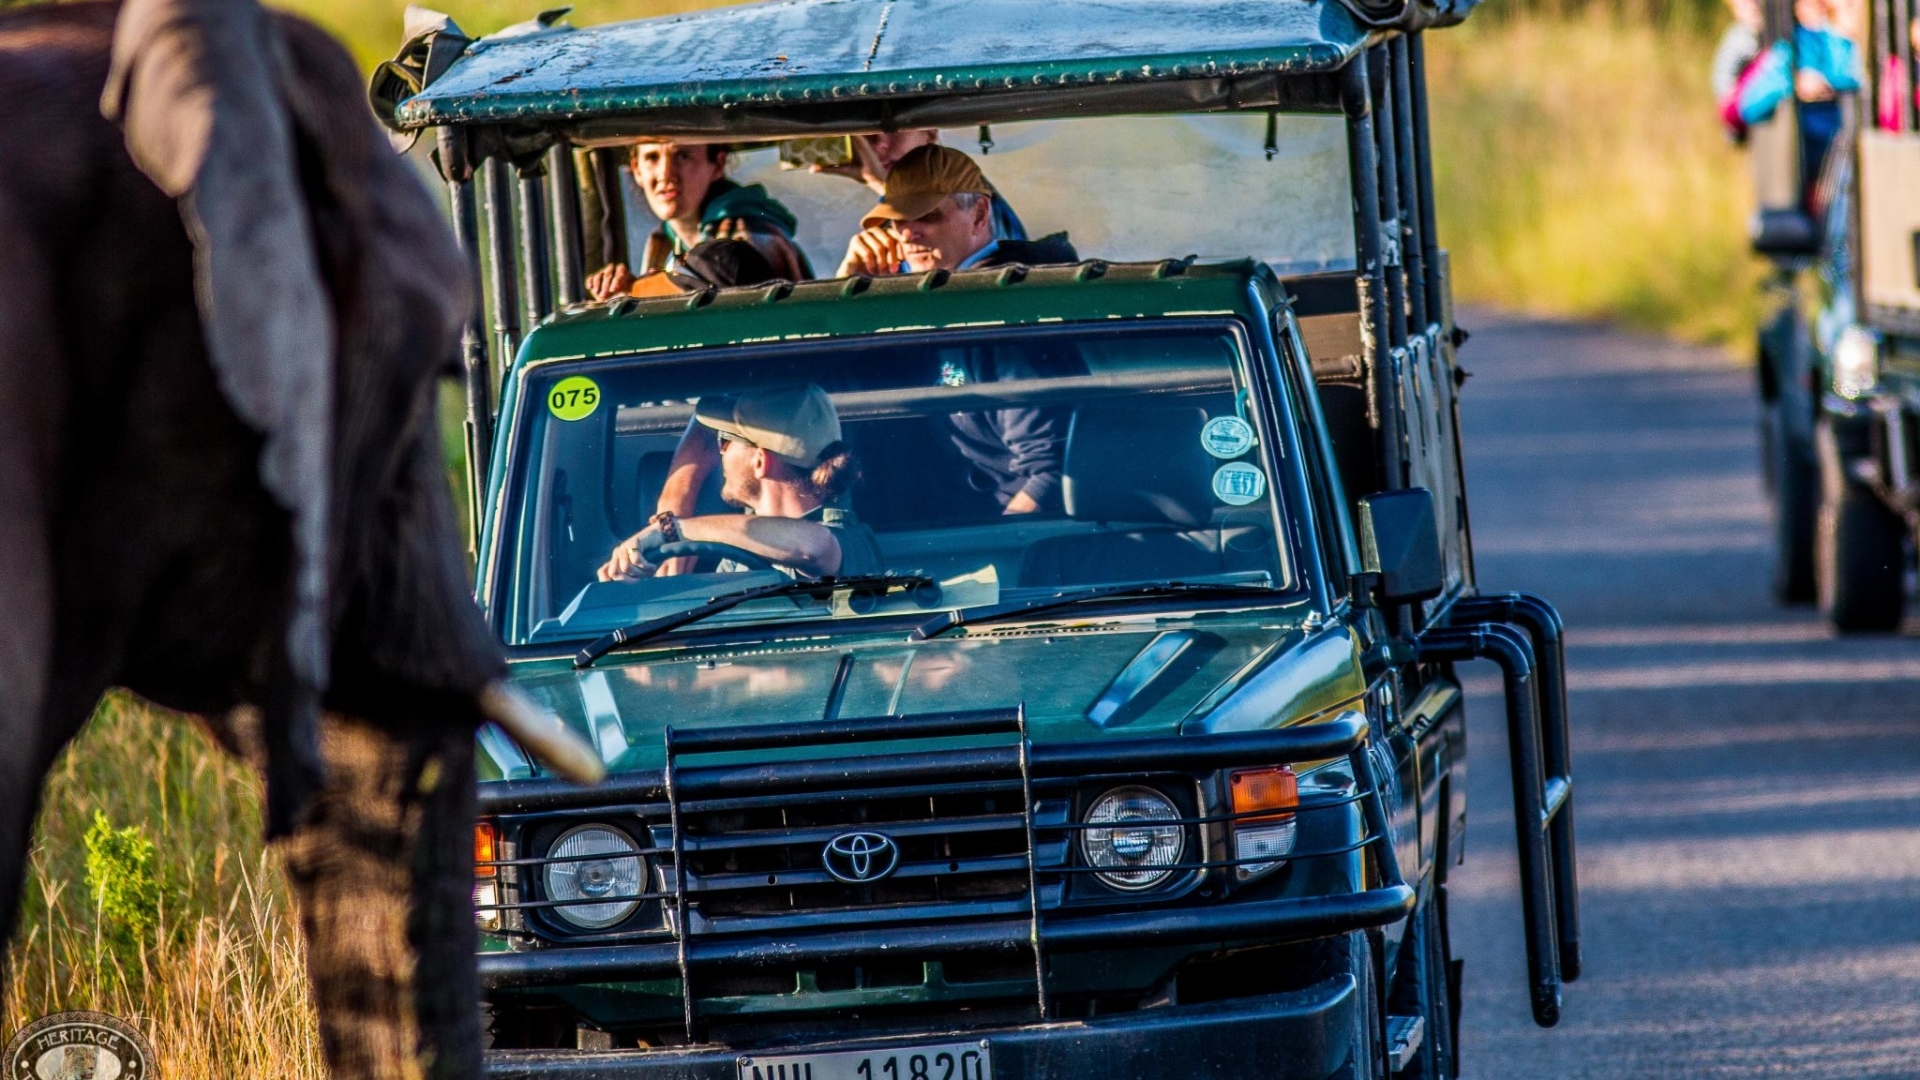 half-day-big-5-safari-to-hluhluwe-imfolozi-park